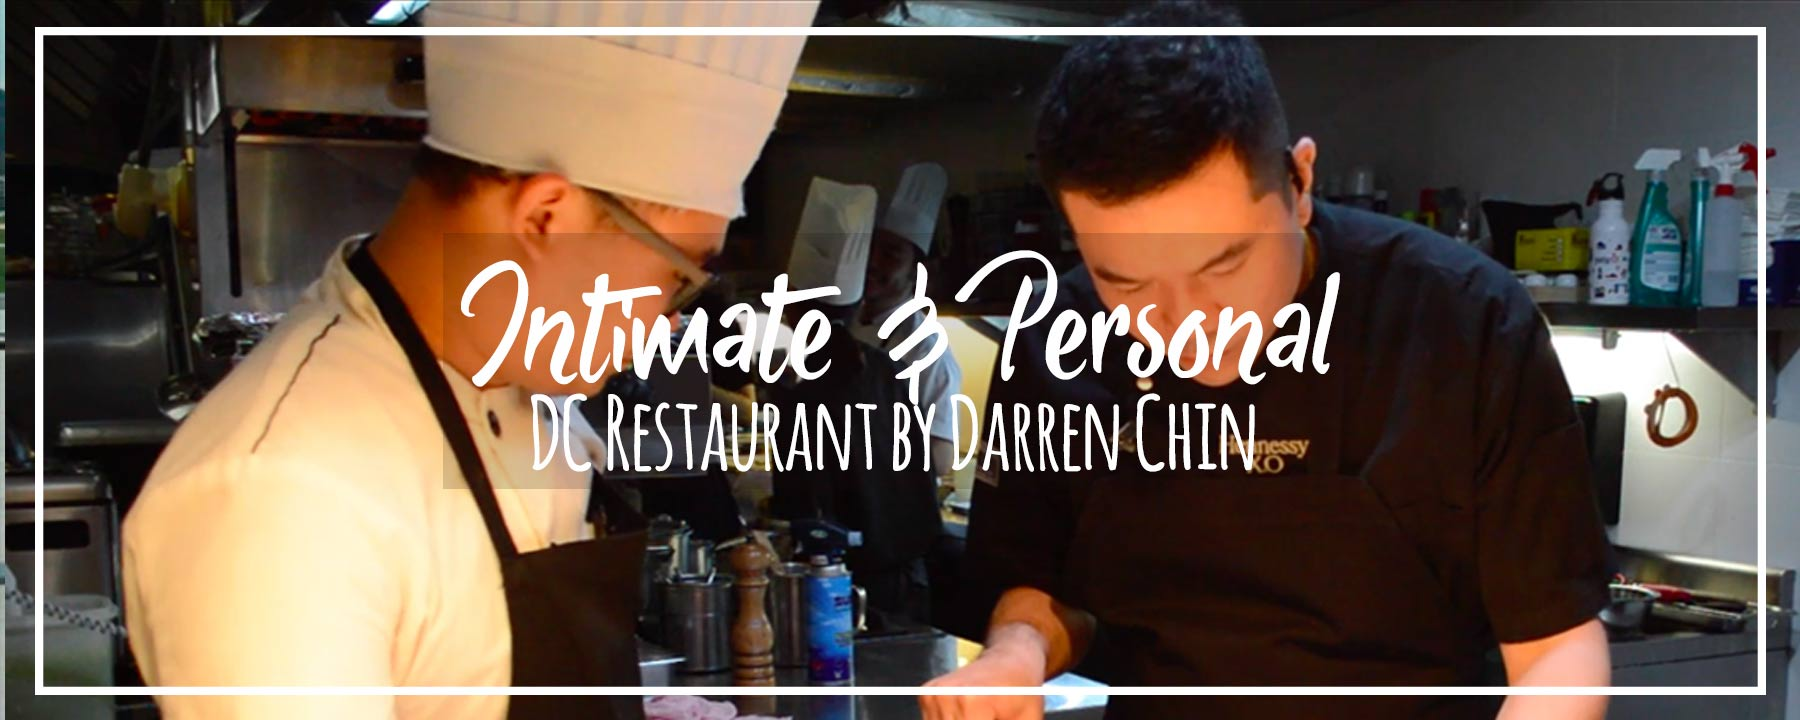 DC Restaurant by Darren Chin – Kuala Lumpur's Best Small, Intimate Fine Dining Restaurant